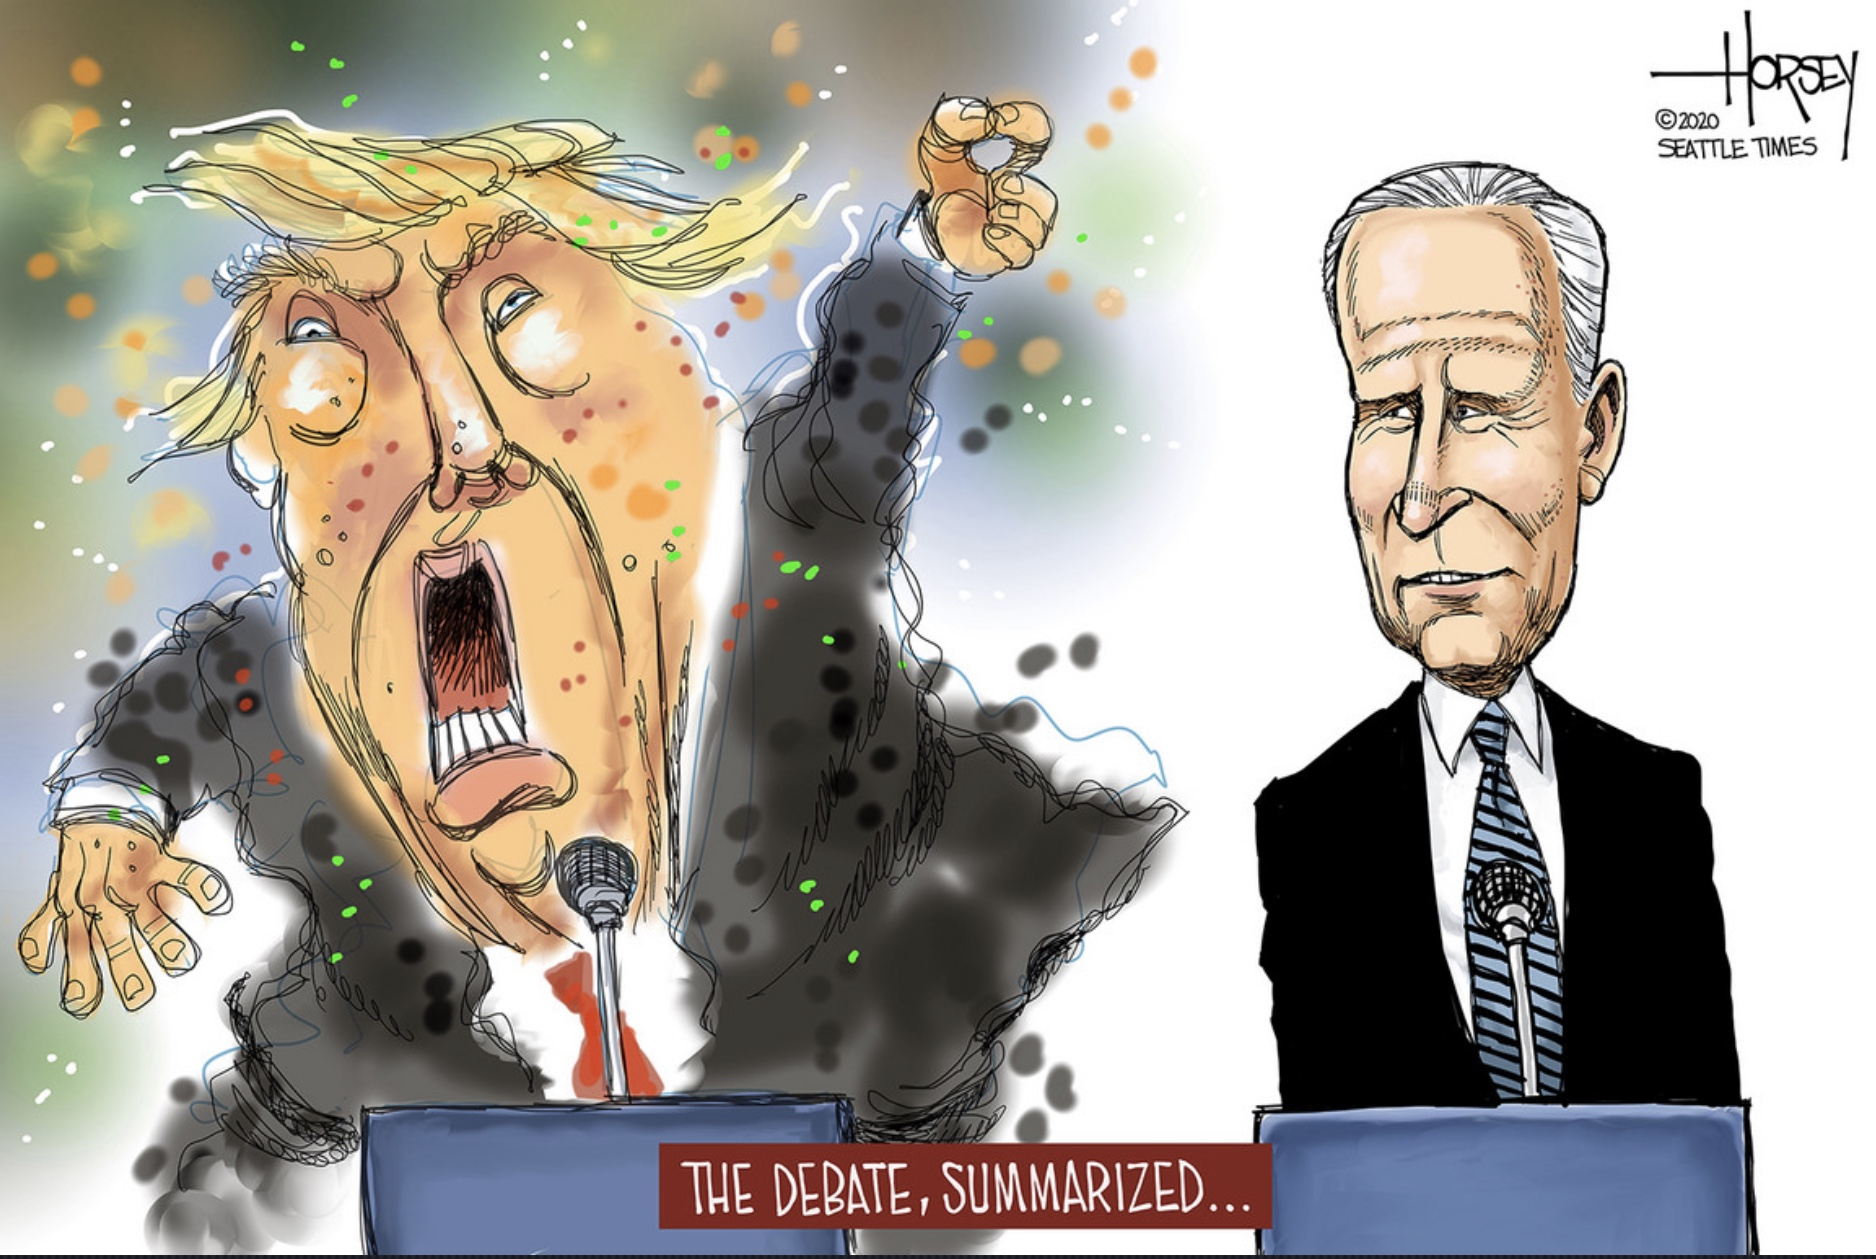 Political cartoons - the 'funny' pics thread.-0b1e3281-374e-4b03-9492-da637c0004f3-jpeg